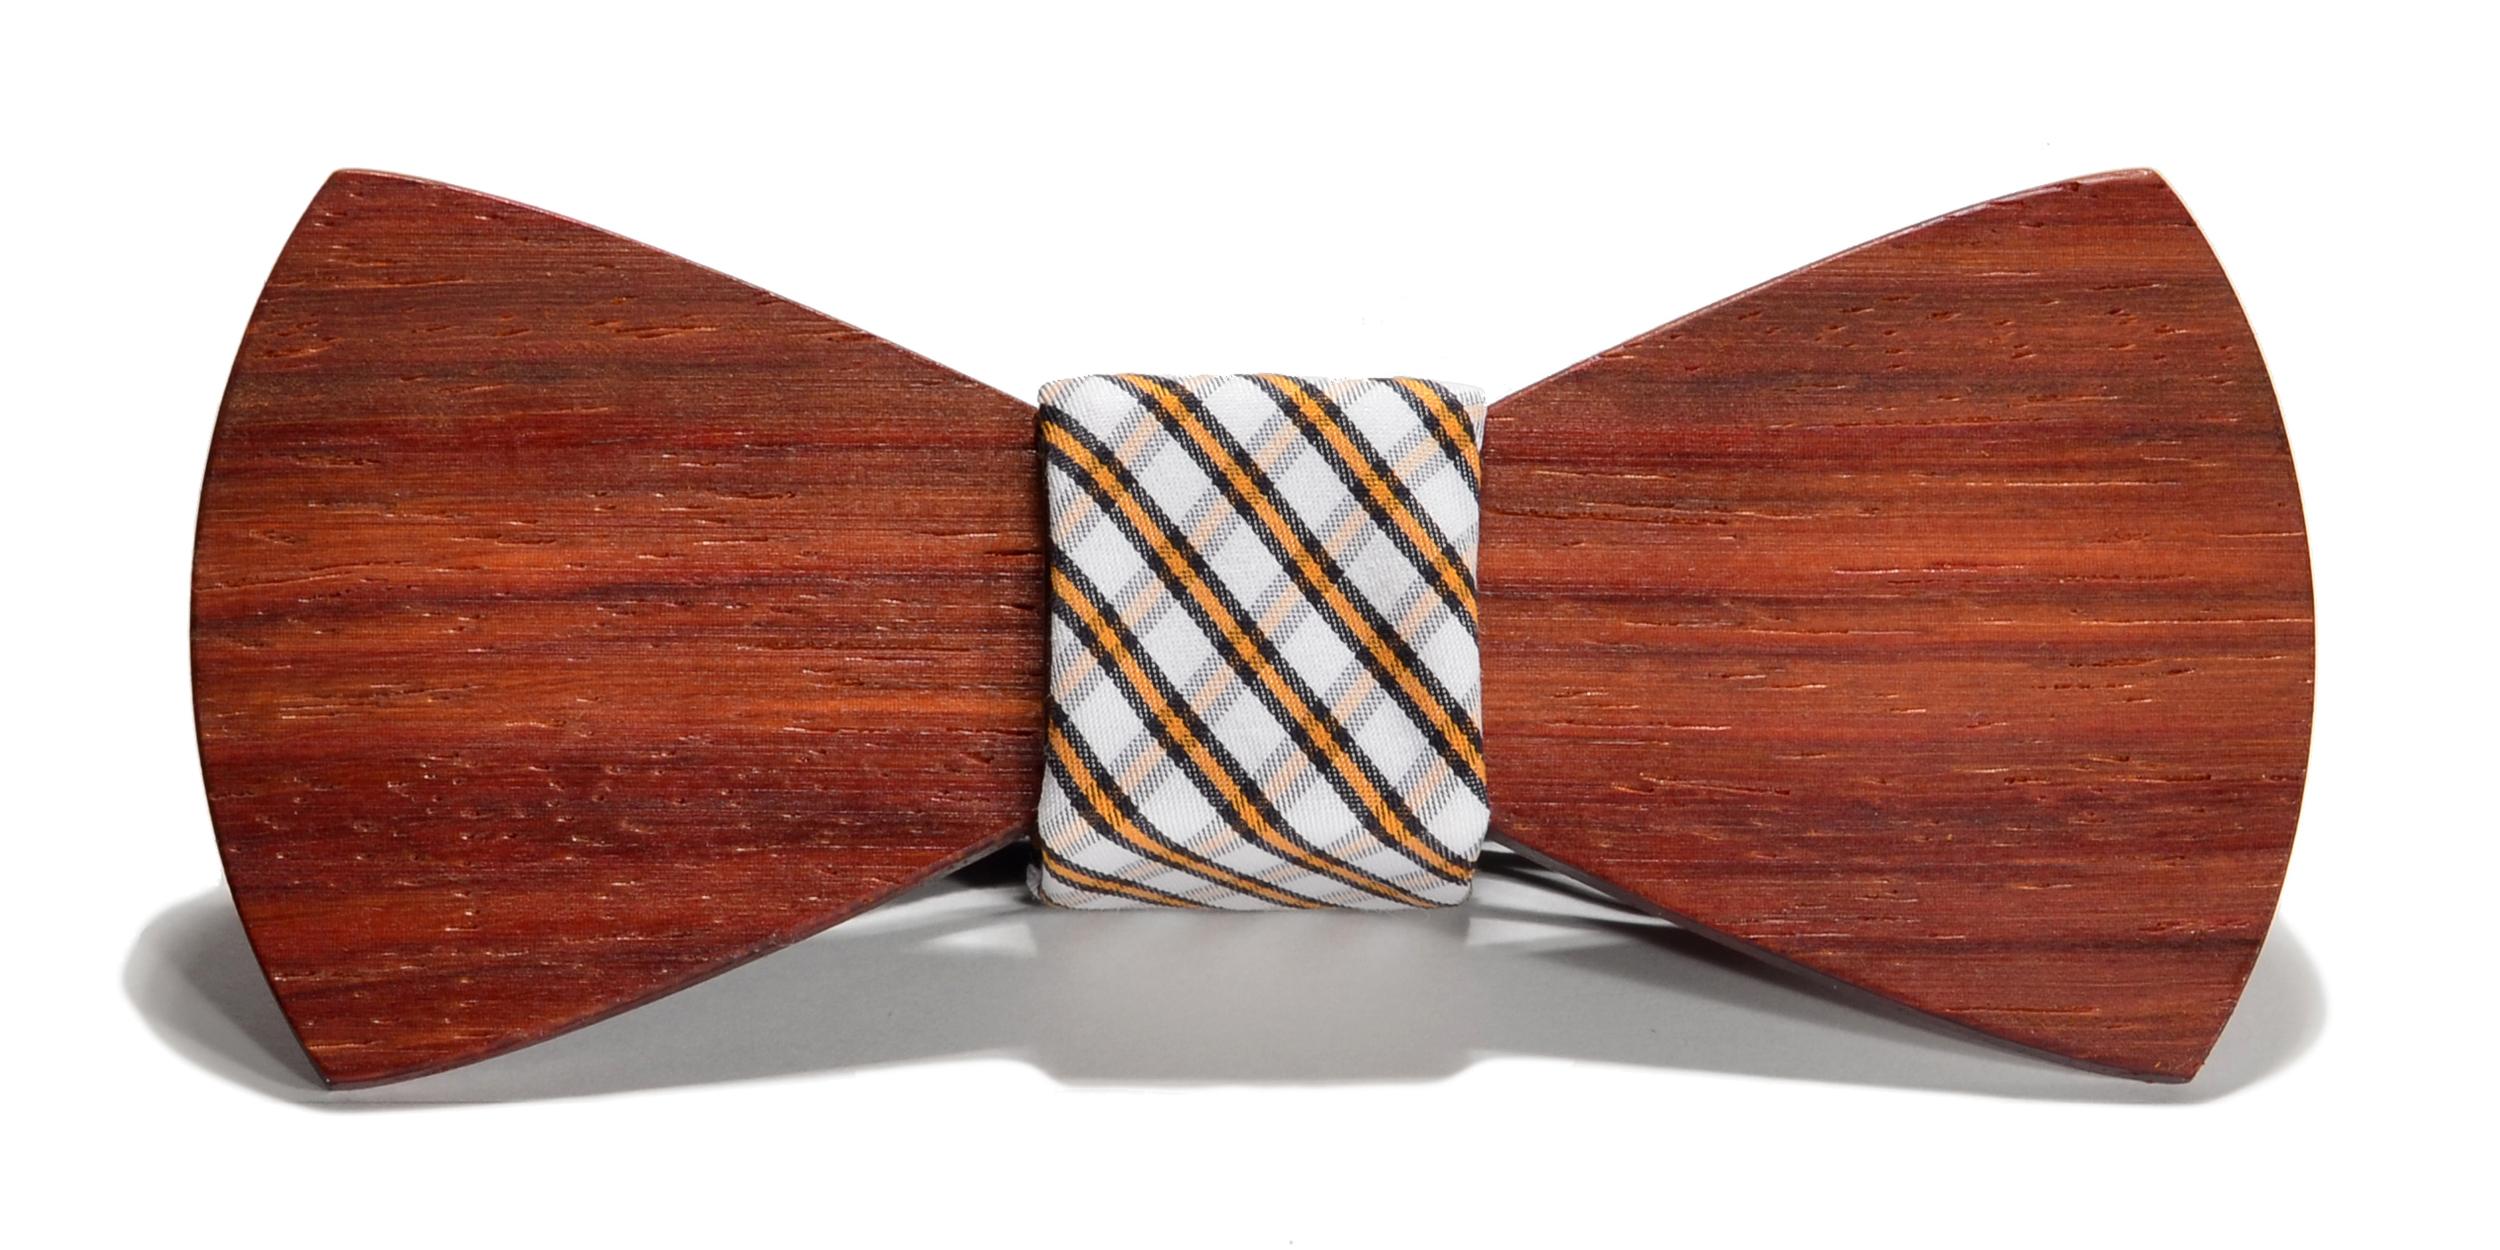 The Huntsman Padauk Traditional Cotton Wooden Bow Tie